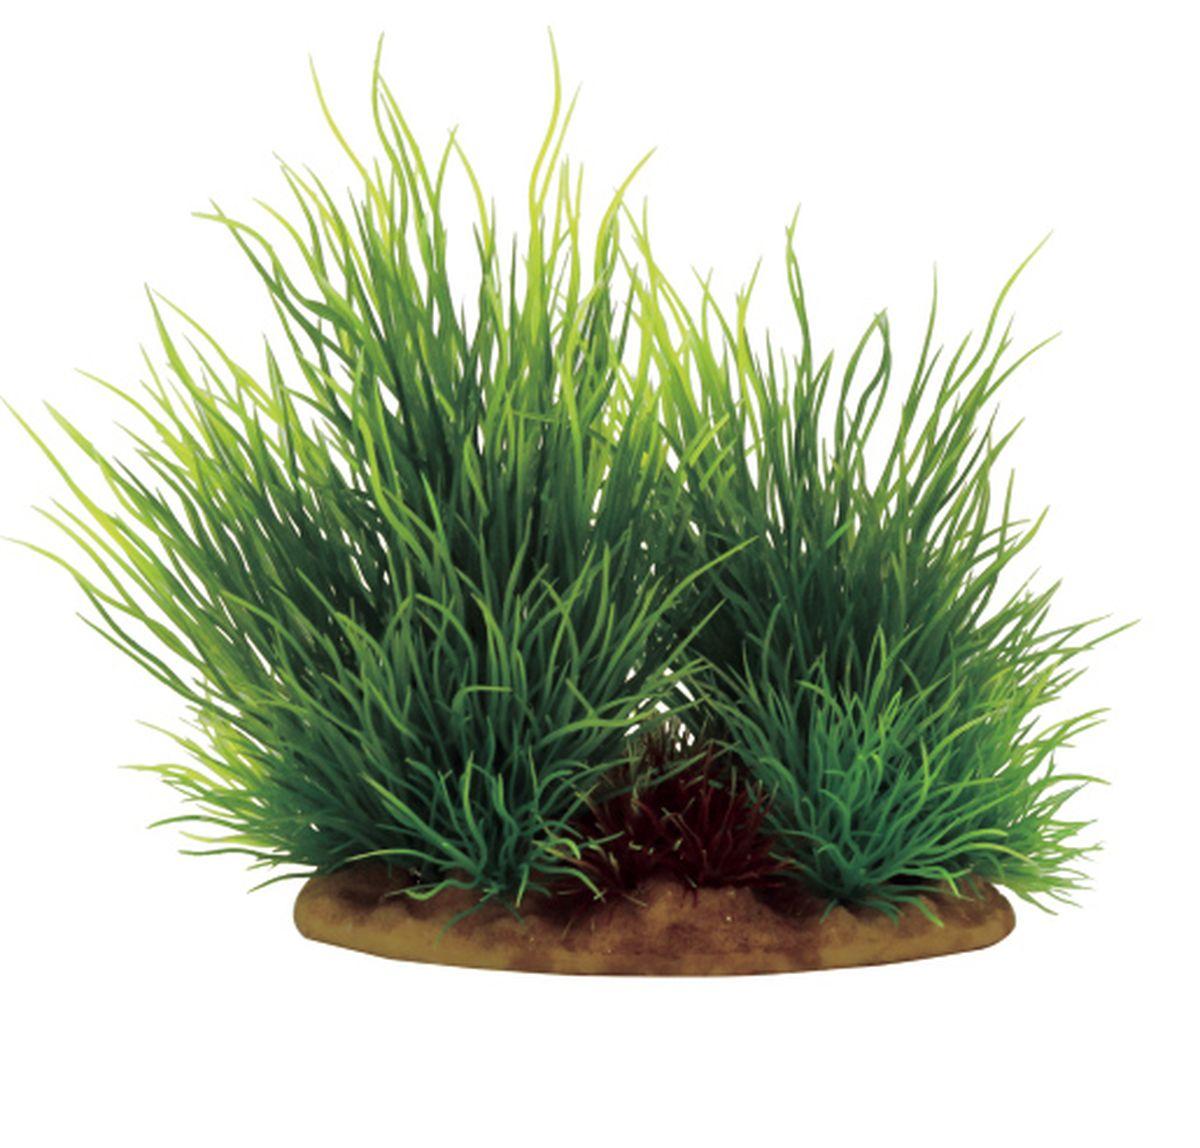 Растение для аквариума ArtUniq Ситняг, 15 x 10 x 15 см101246Растение для аквариума ArtUniq Ситняг, 15 x 10 x 15 см